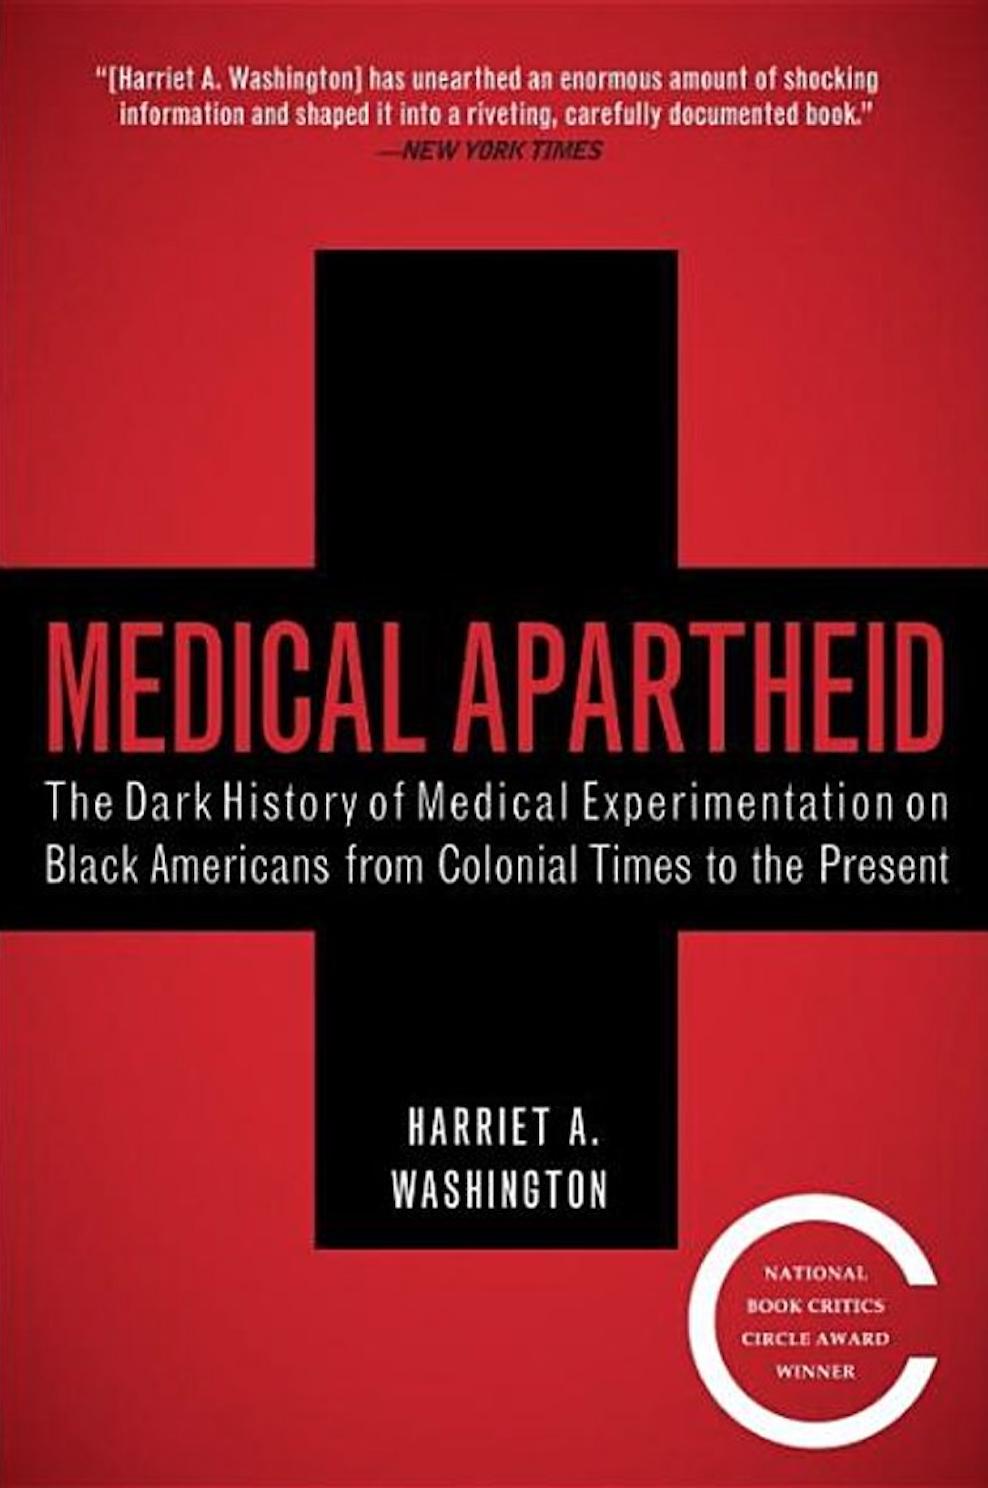 Medical Apartheid ($18)